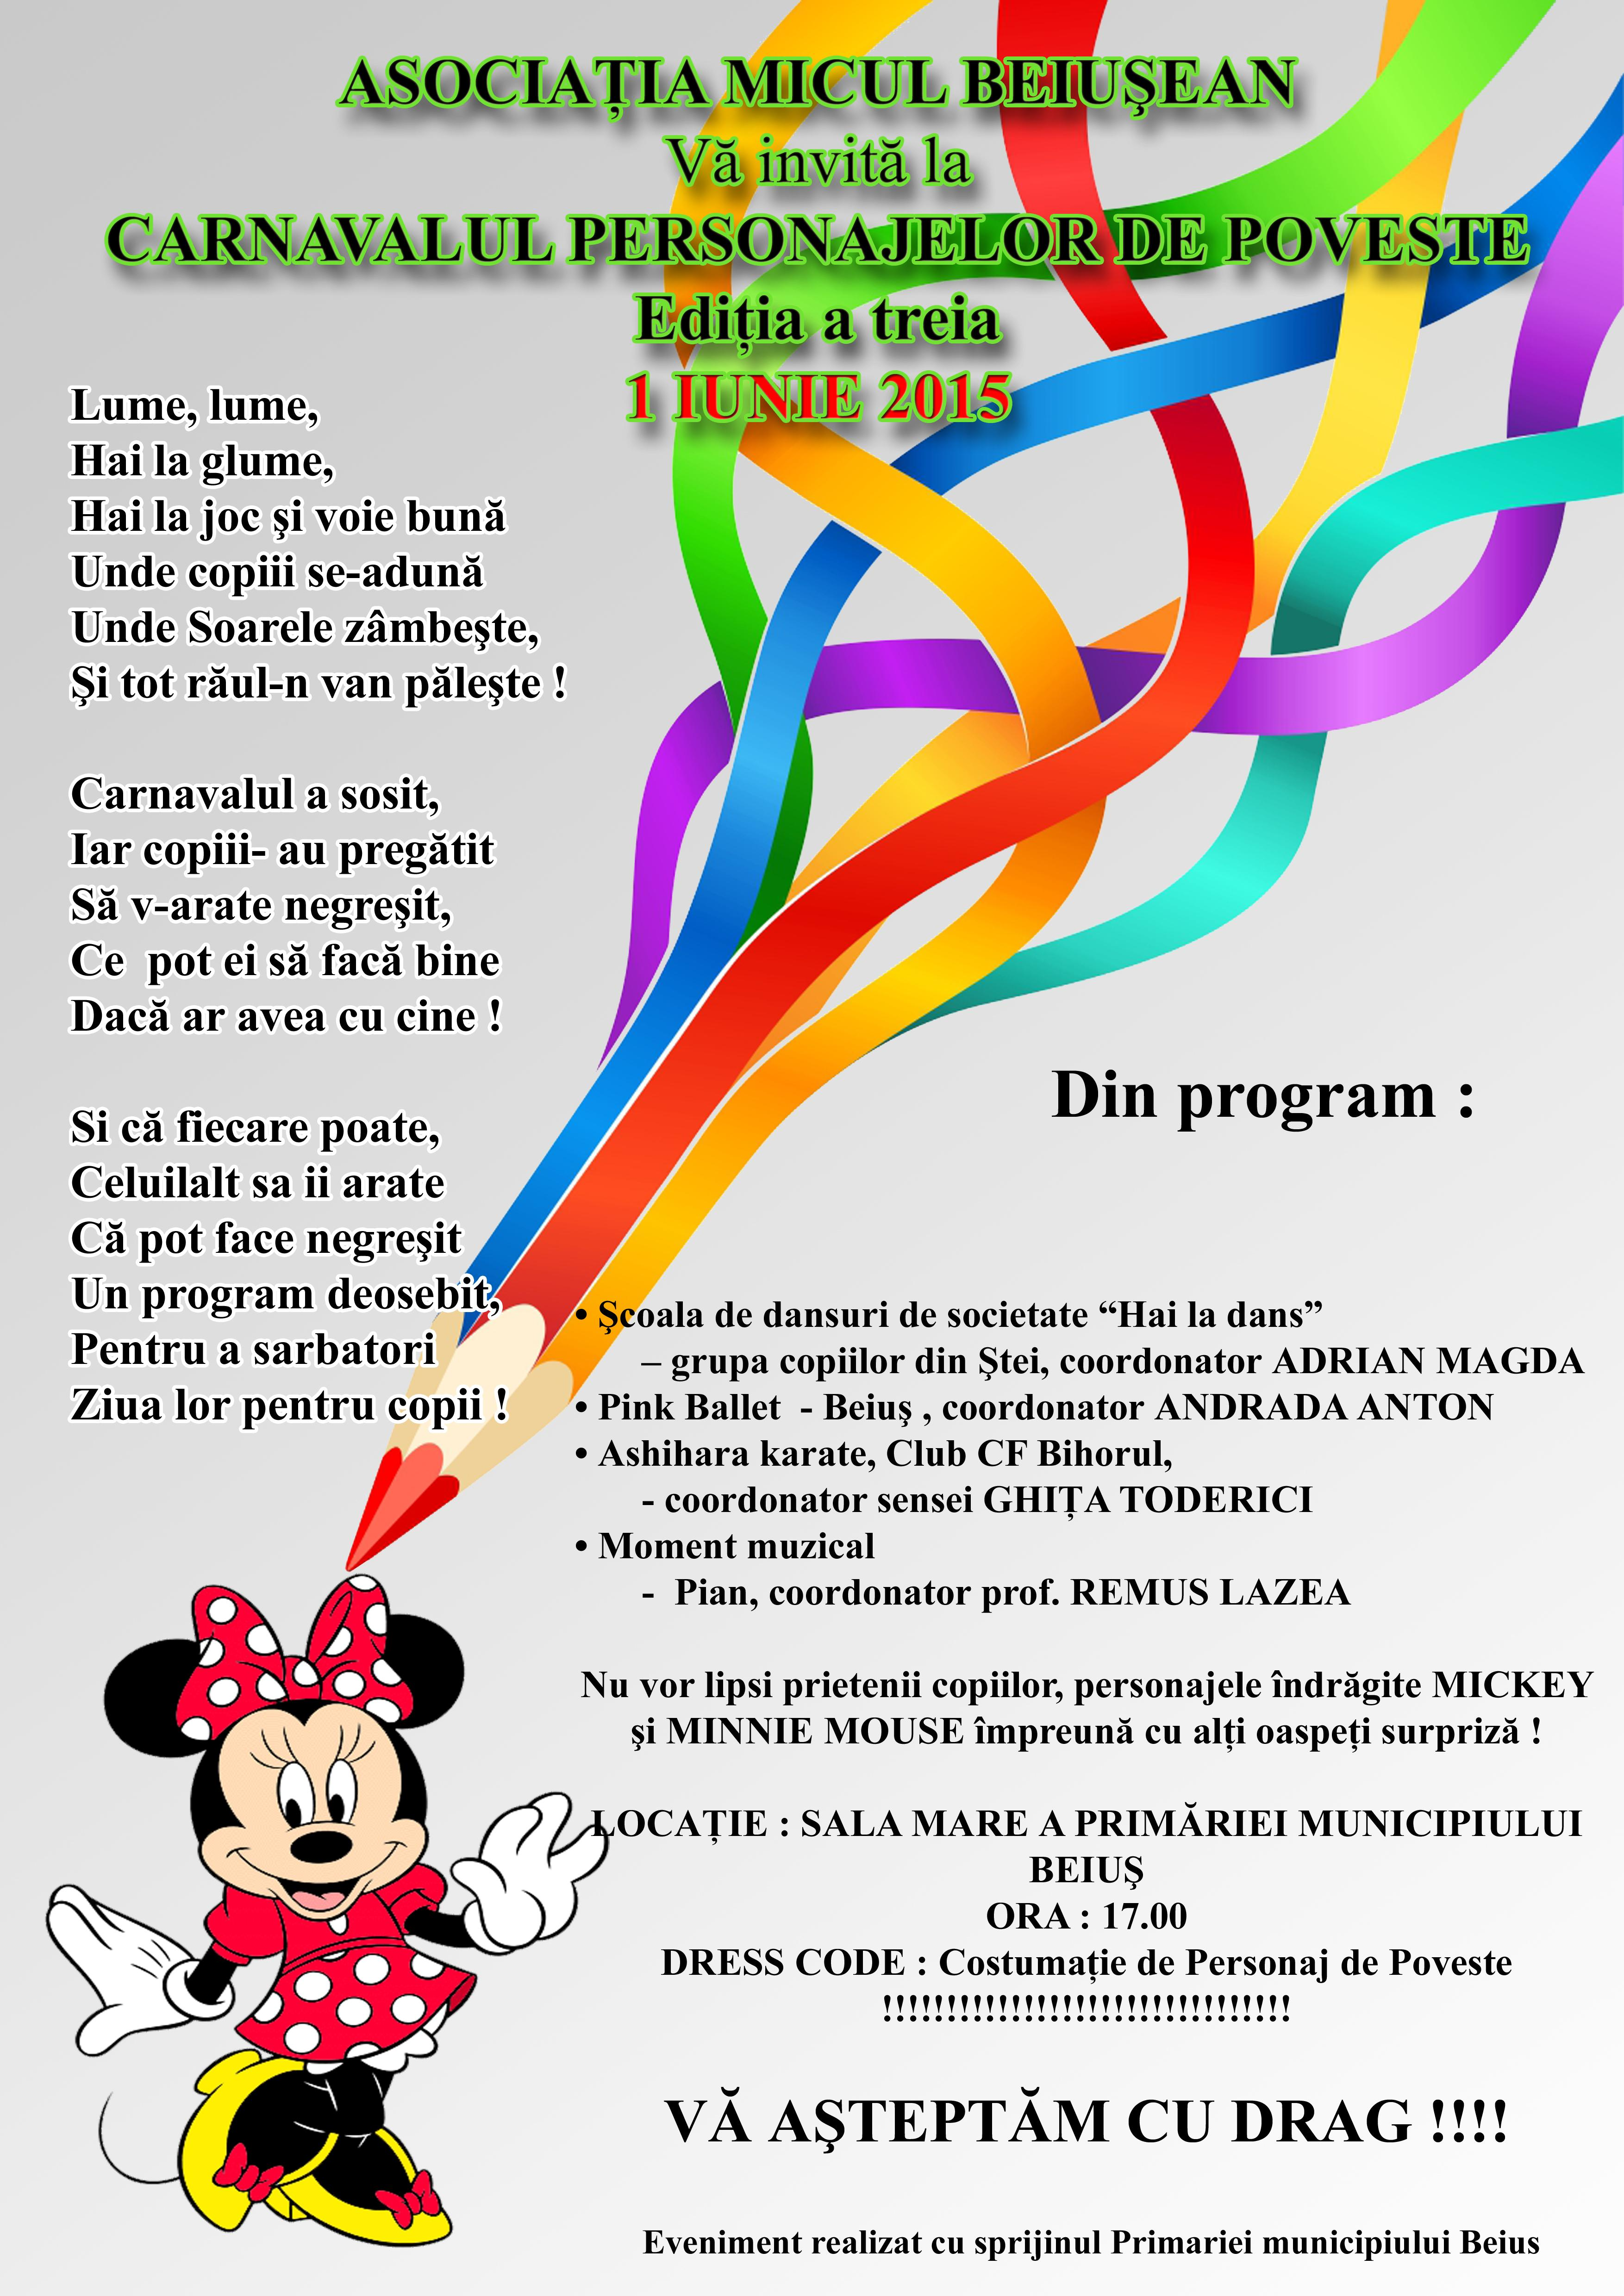 Carnavalul personajelor de poveste,  editia a III a, 1 iunie 2015